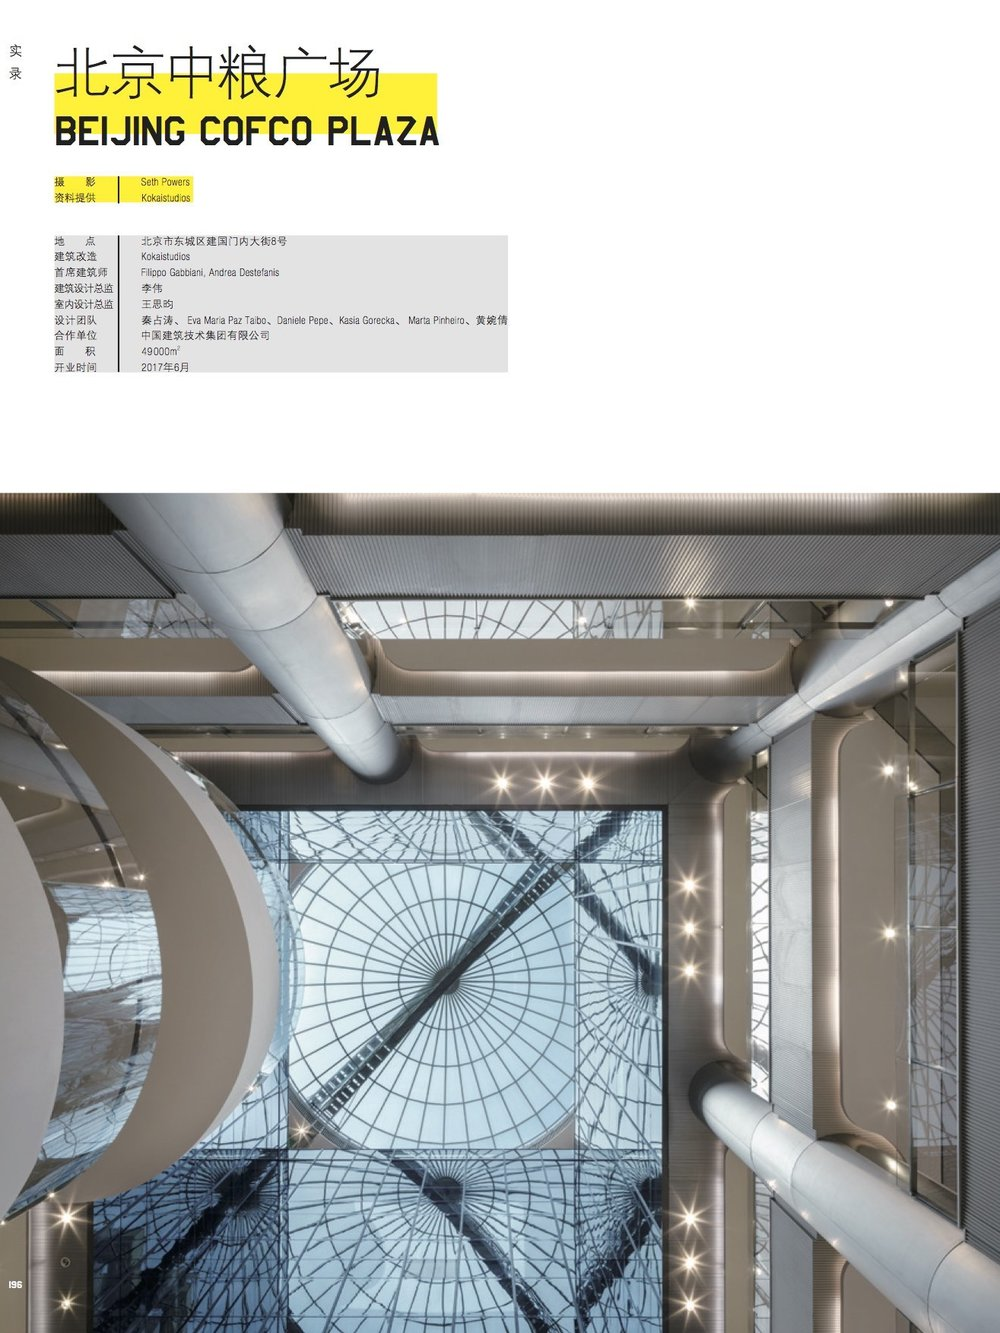 Interior Designer | Vol 66 March 2018 - Beijing COFCO Plaza | Kokaistudios